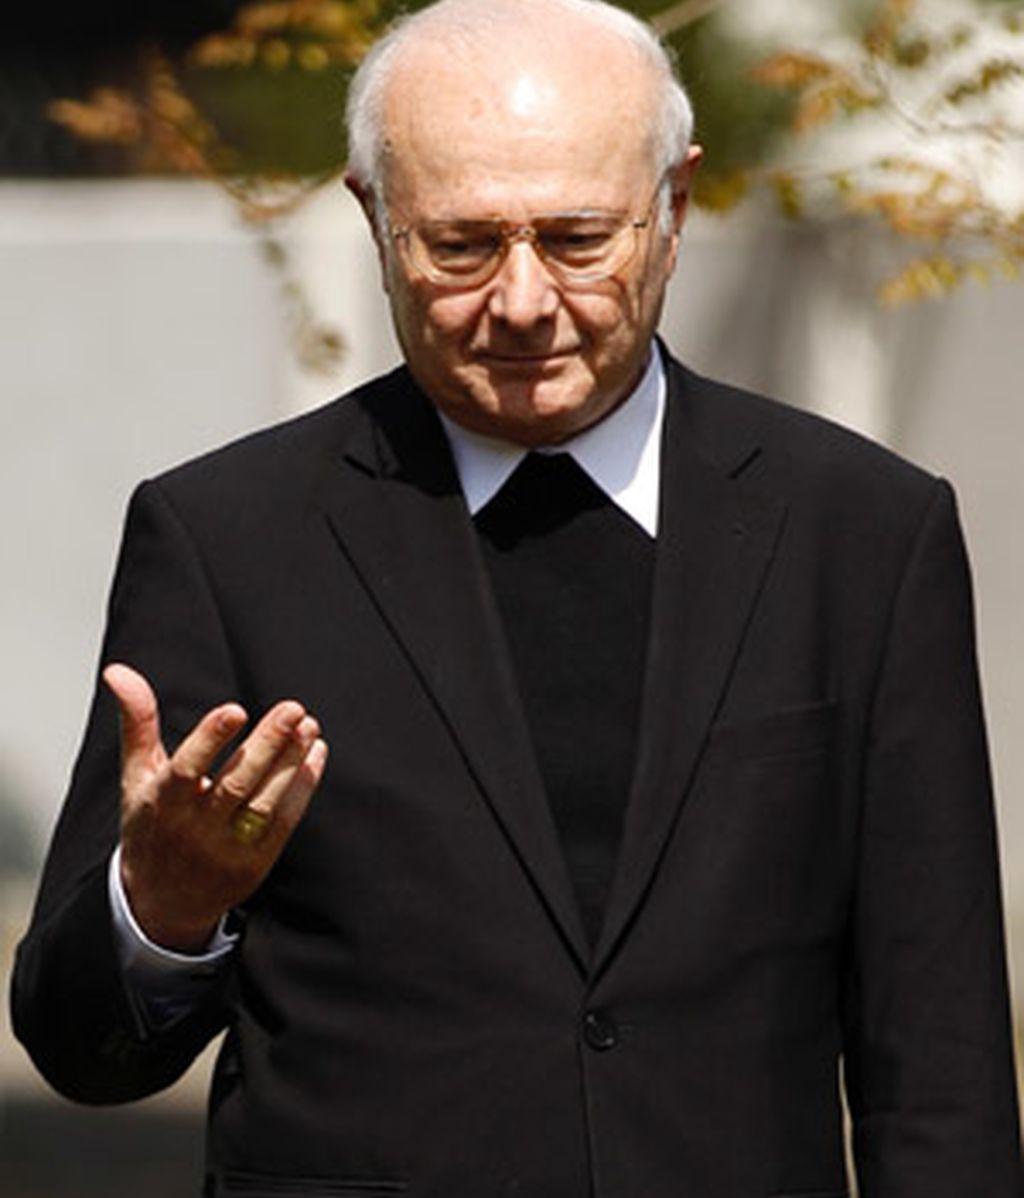 Obispo acusado de pederastia en belgica